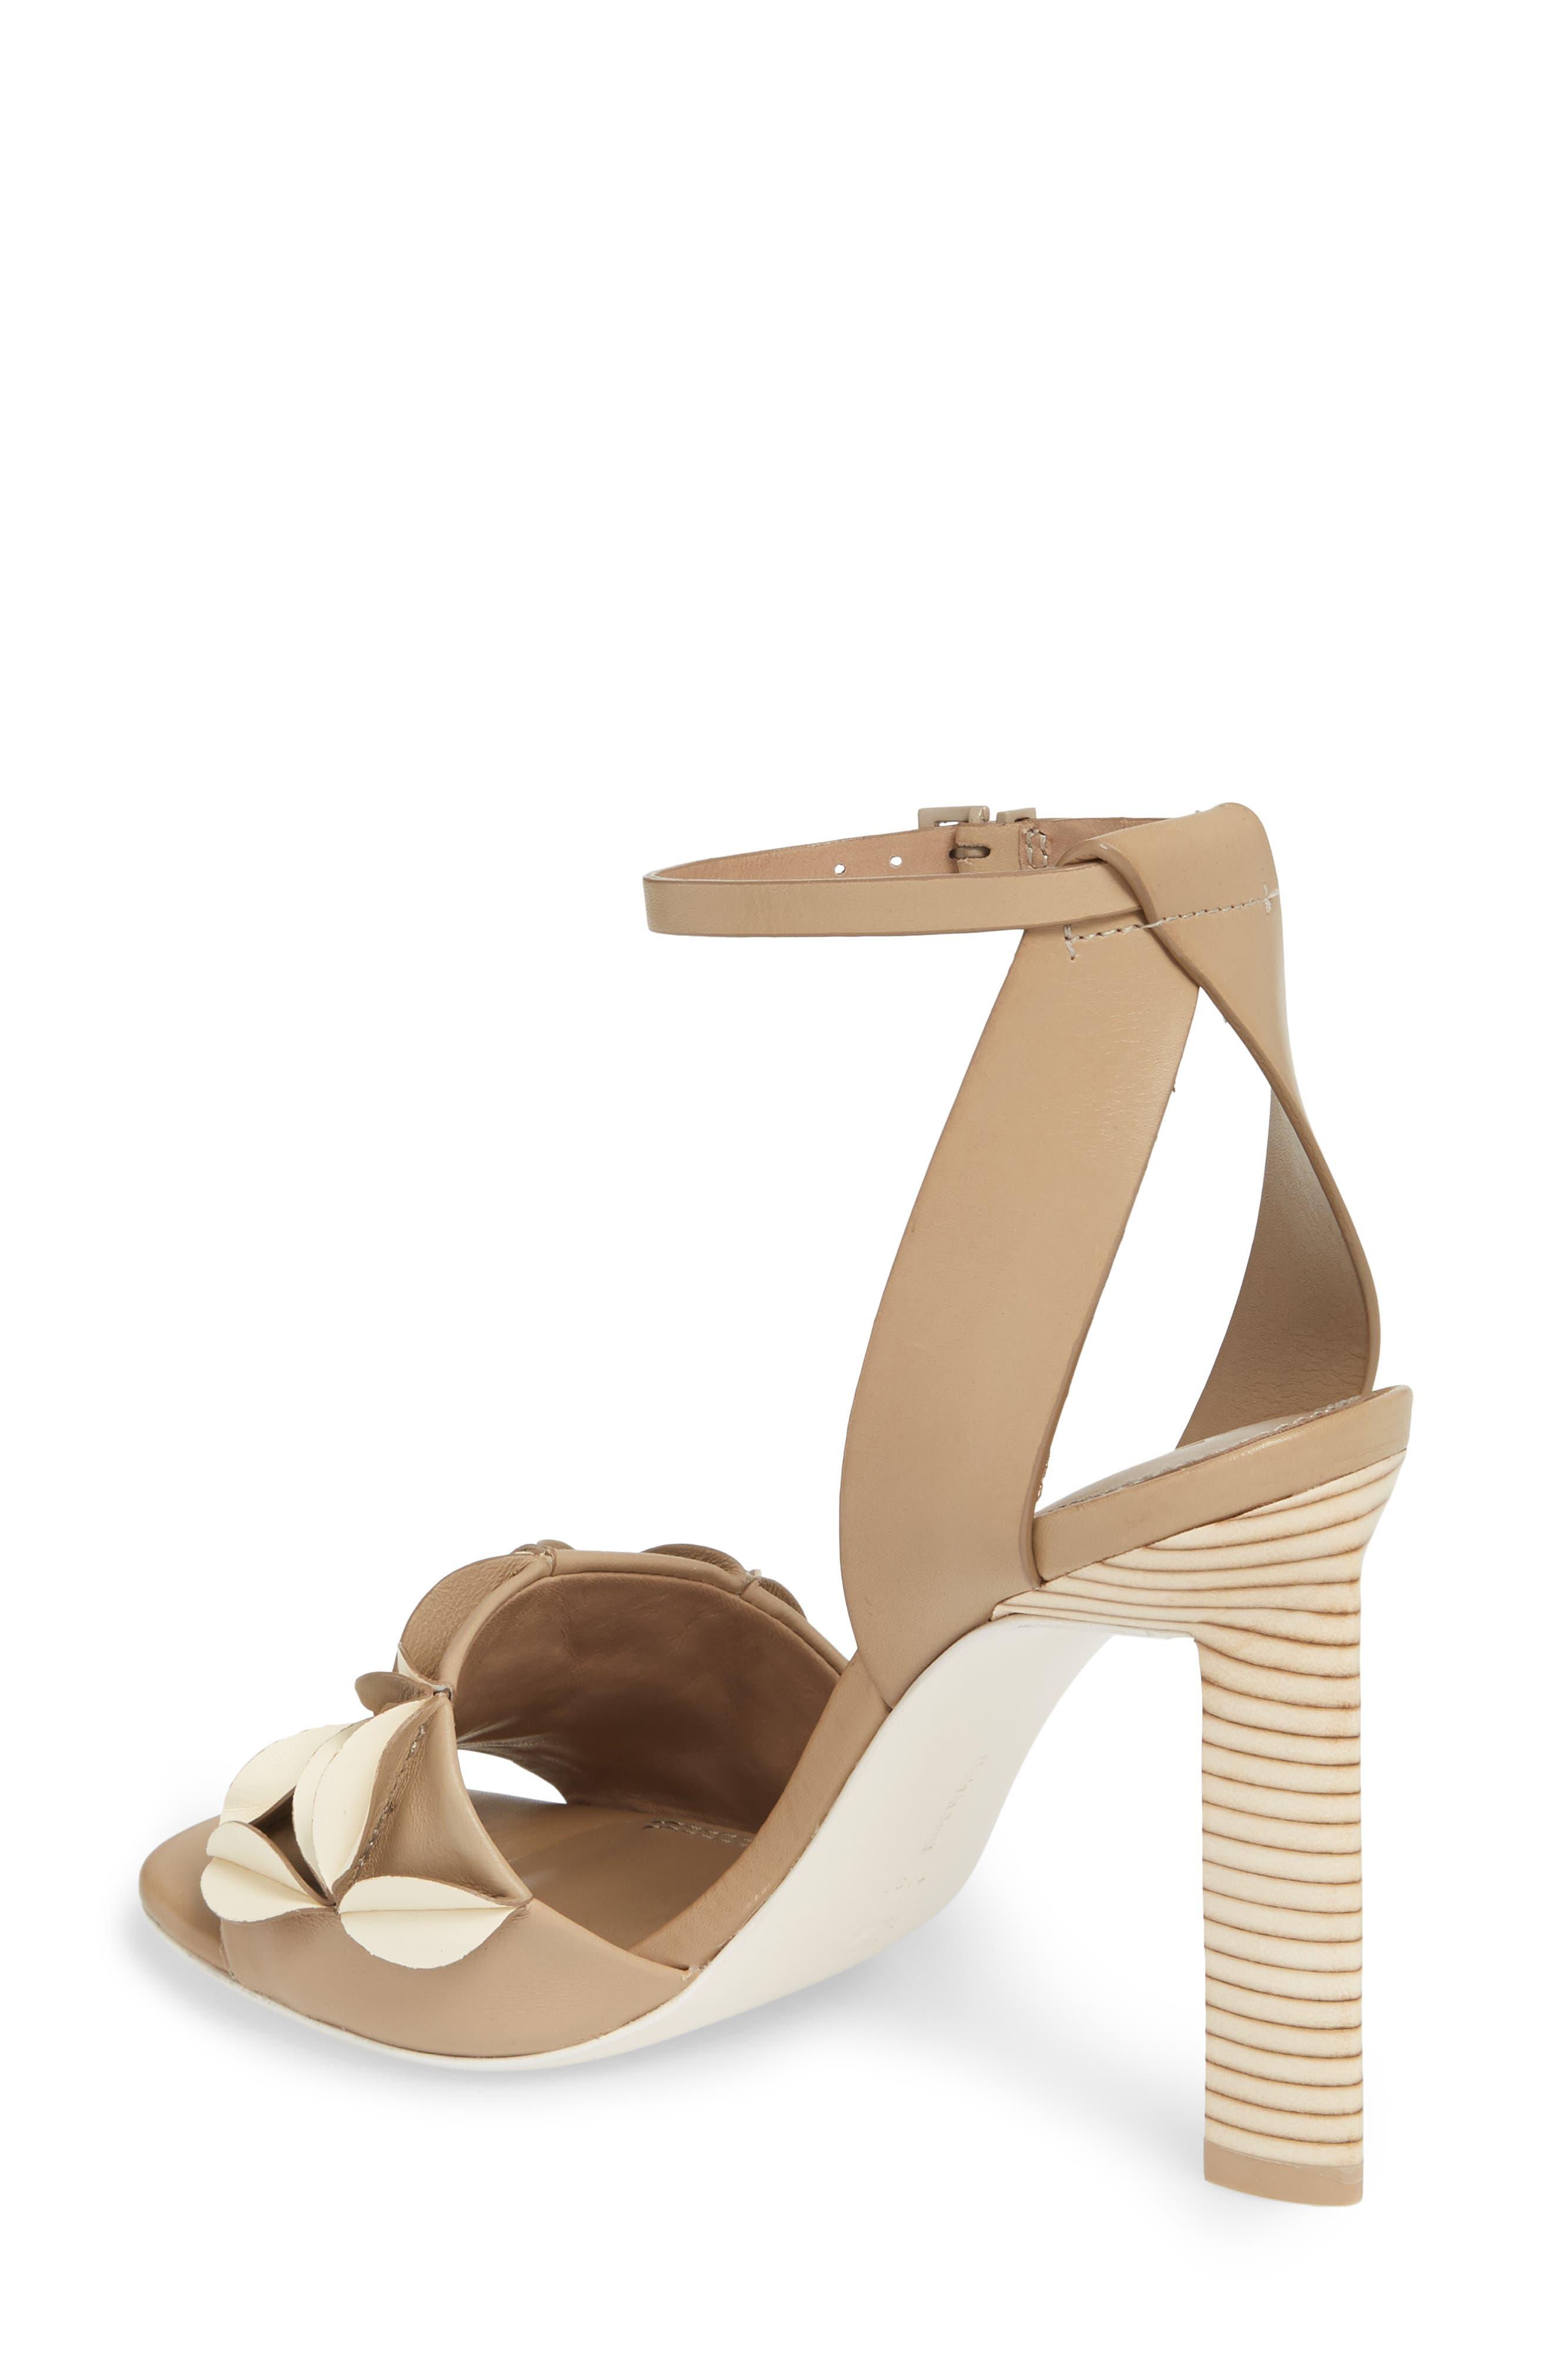 Milee Ankle Strap Sandal,                             Alternate thumbnail 2, color,                             250